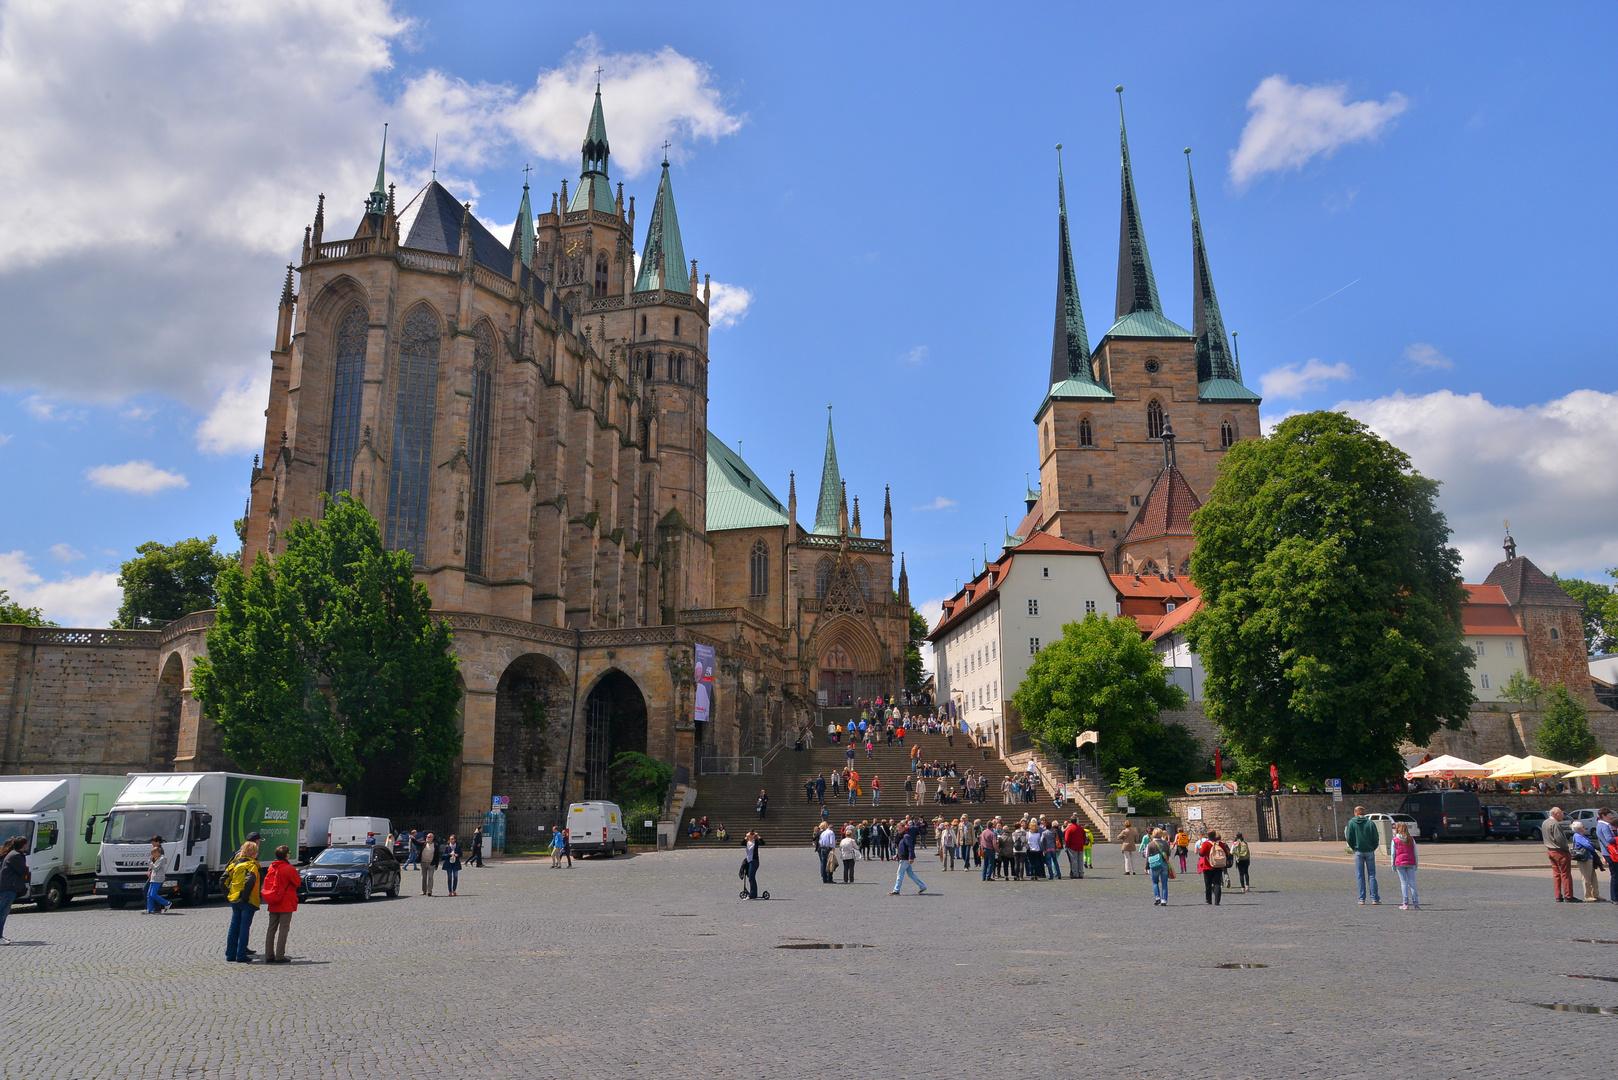 Erfurt, Bilder einer schönen Stadt VI (imágenes de una bella ciudad VI)